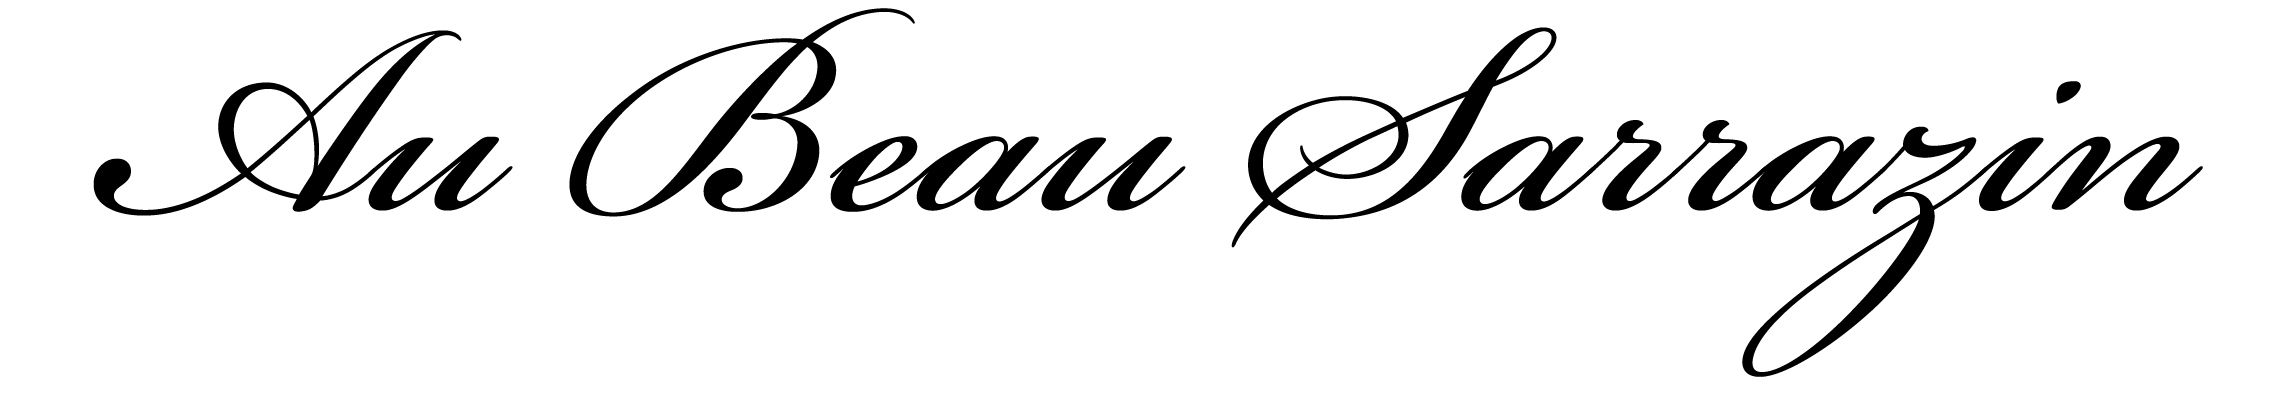 Gite Au Beau Sarrazin